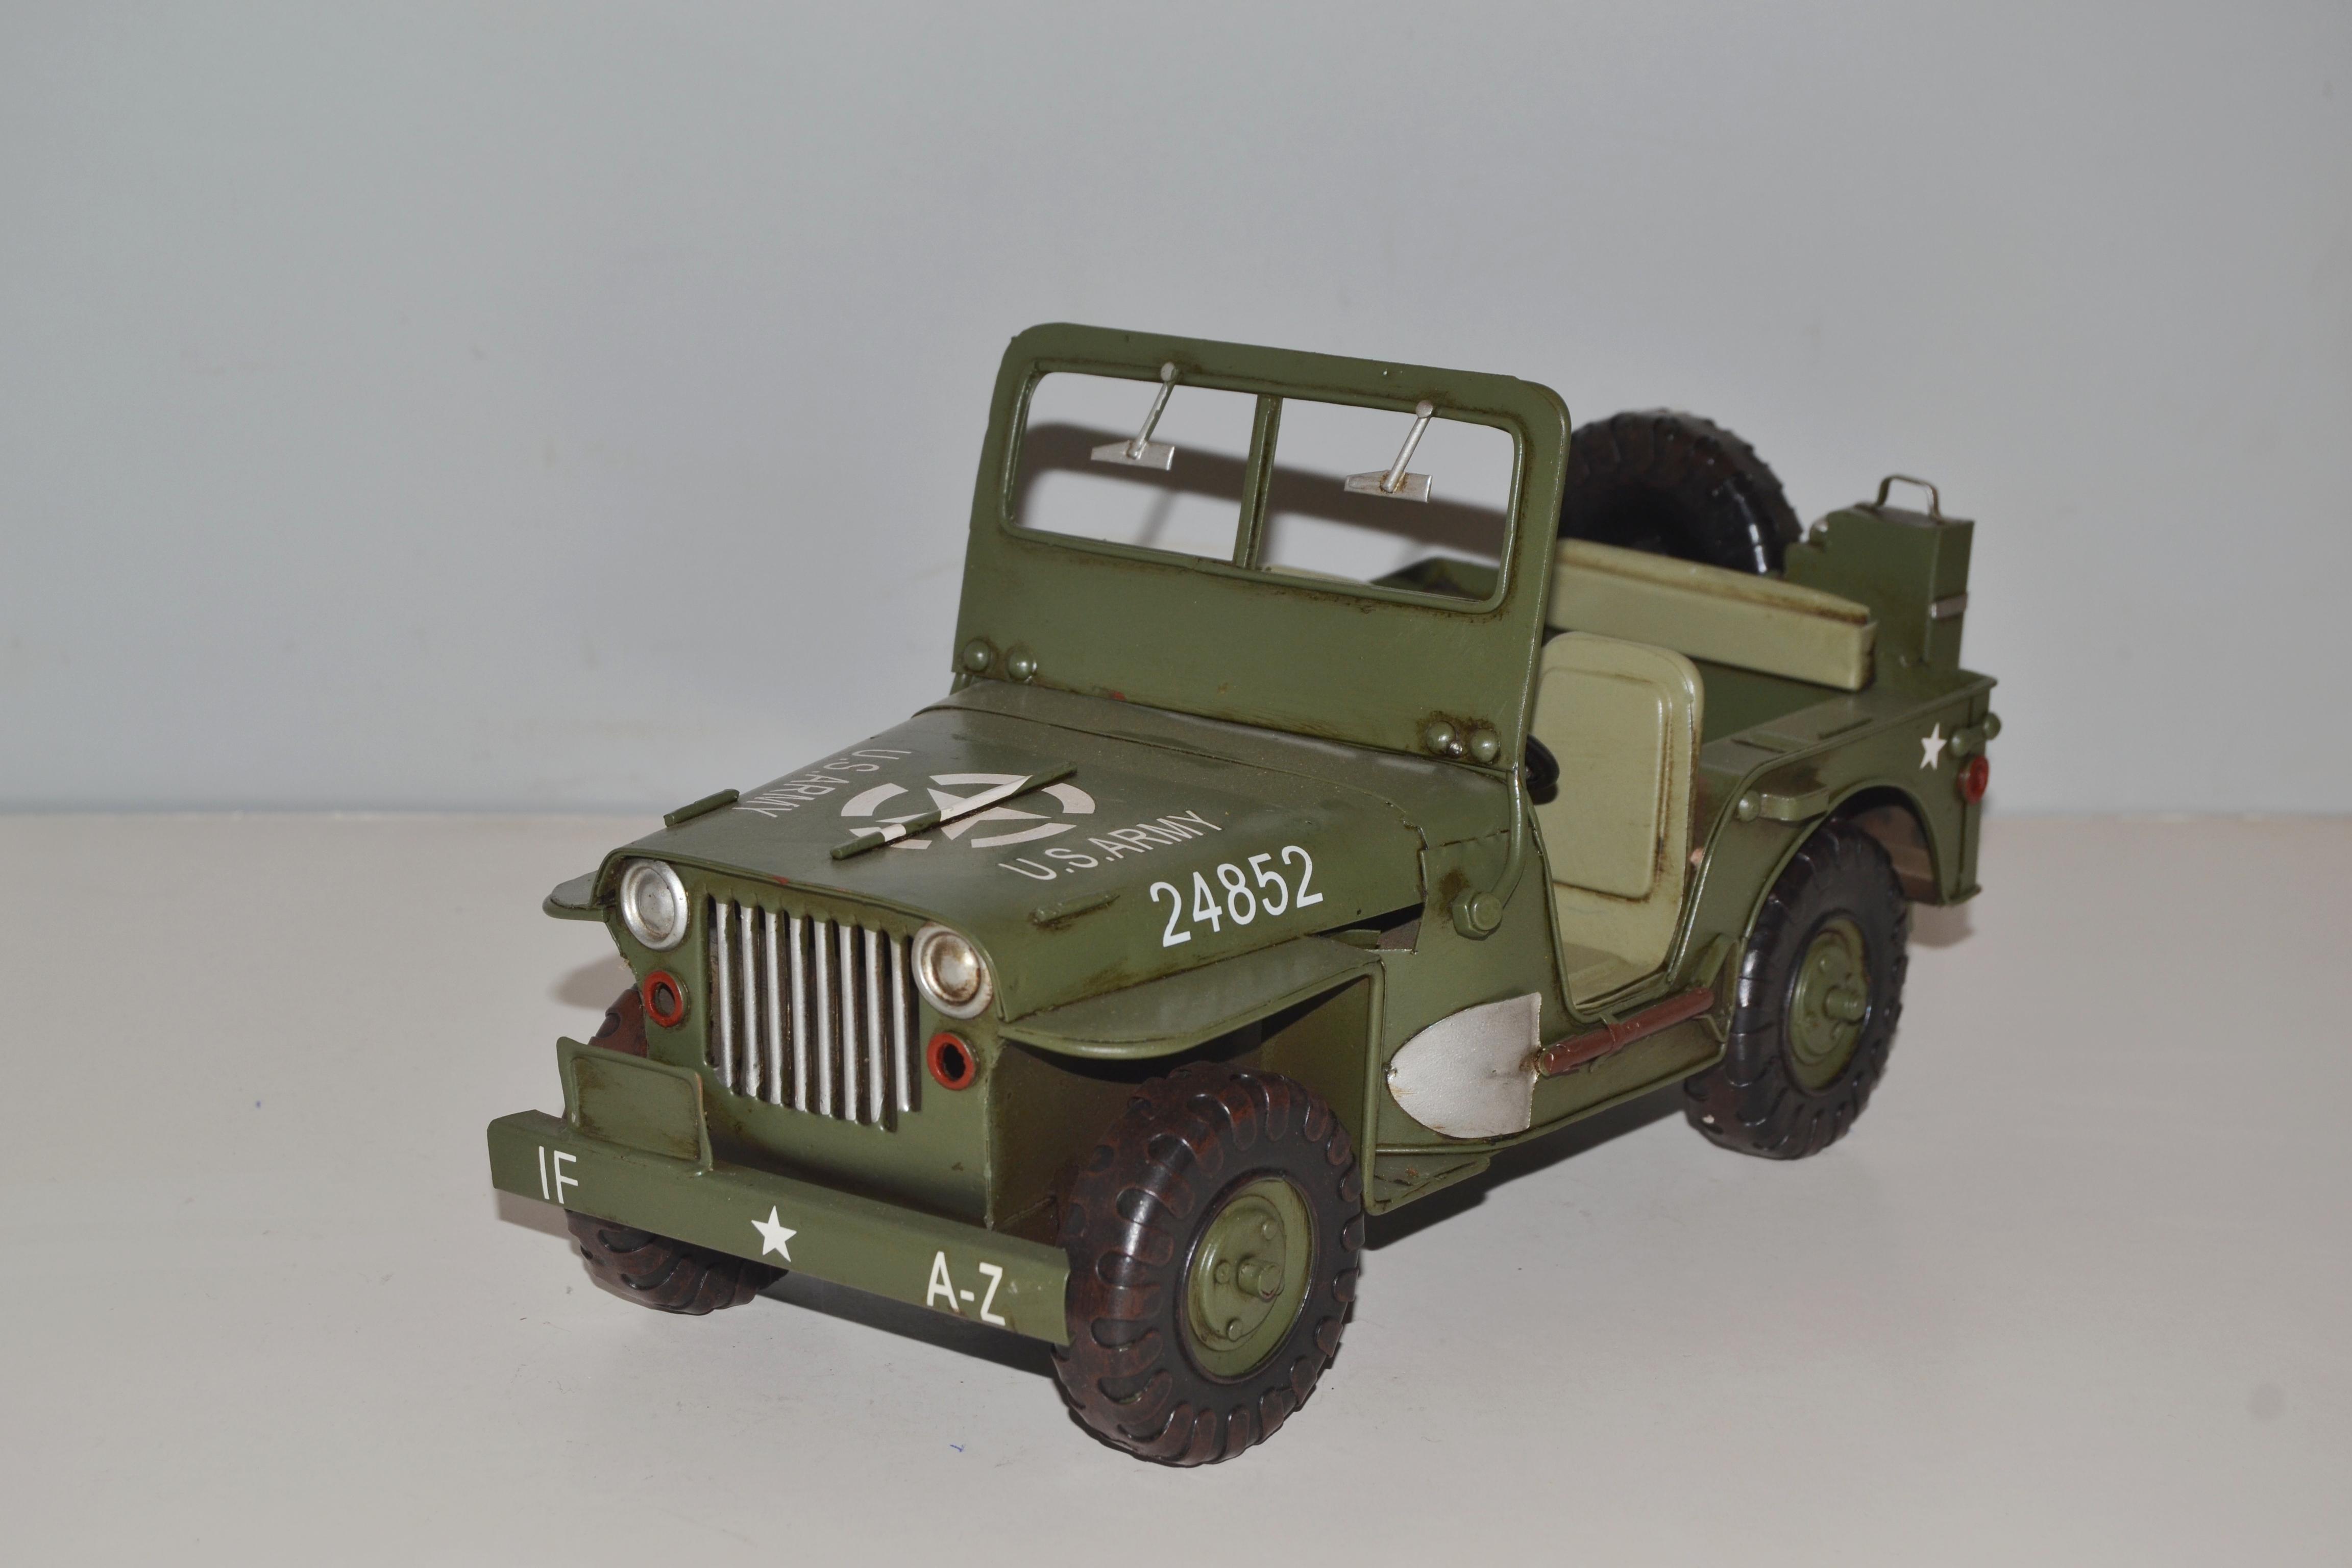 modellbau jeep willys neu jeep willys cj 2 1944 1945. Black Bedroom Furniture Sets. Home Design Ideas